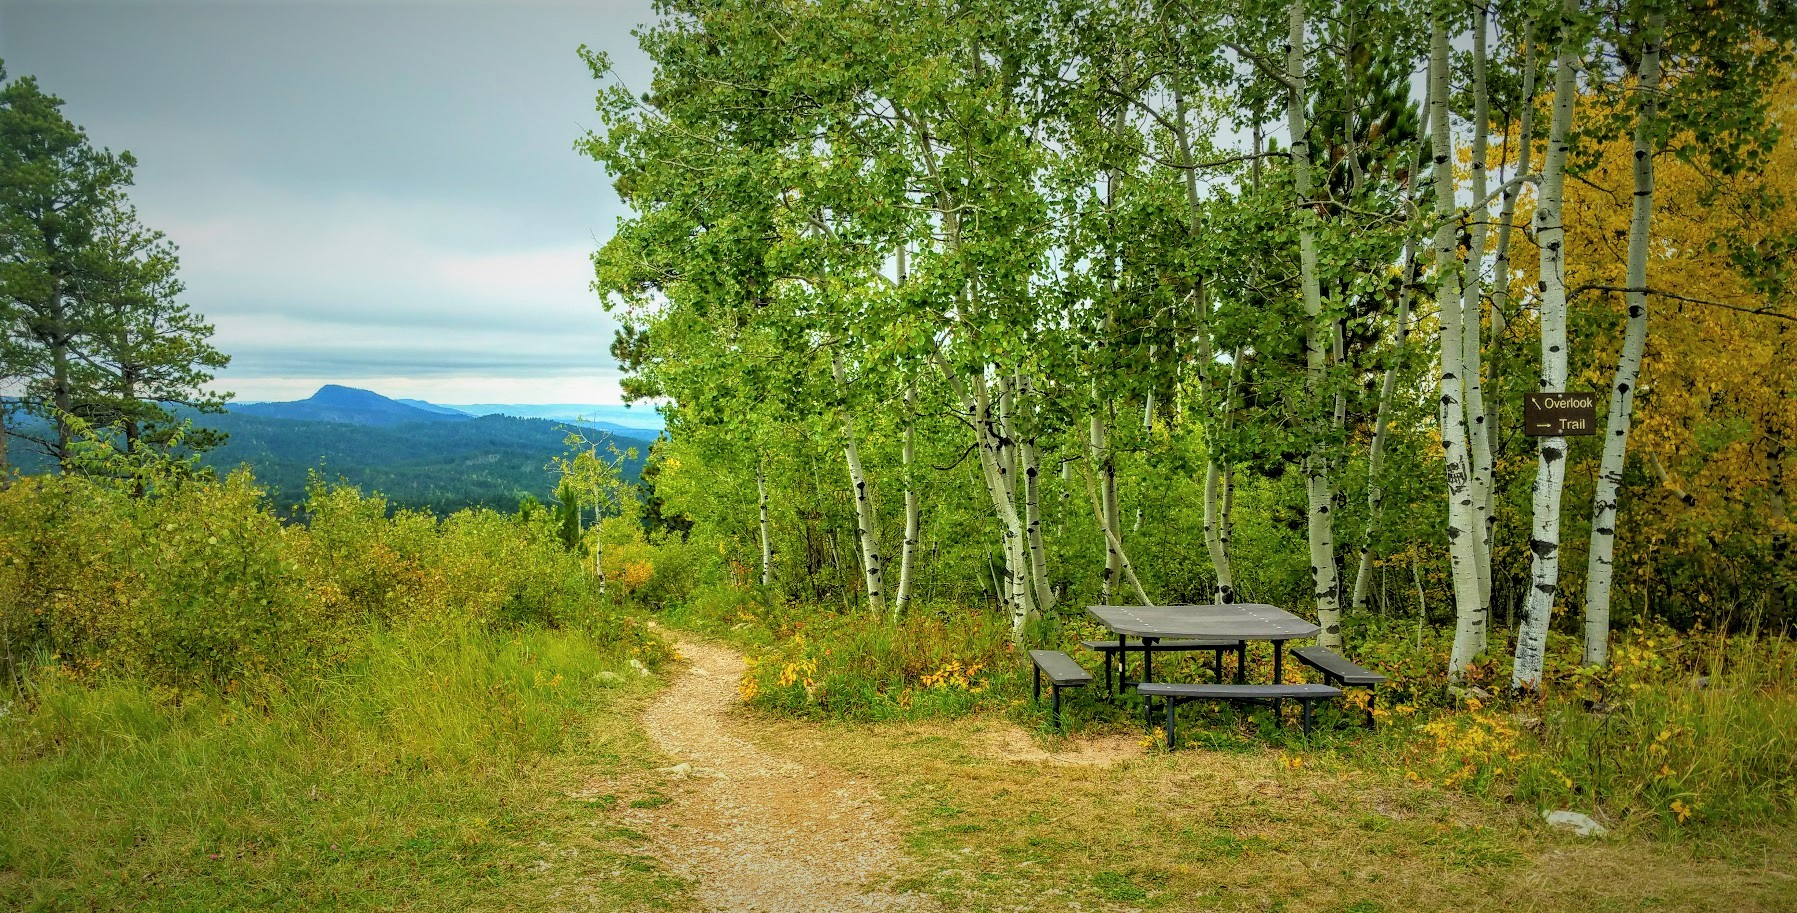 Mount Roosevelt Trail